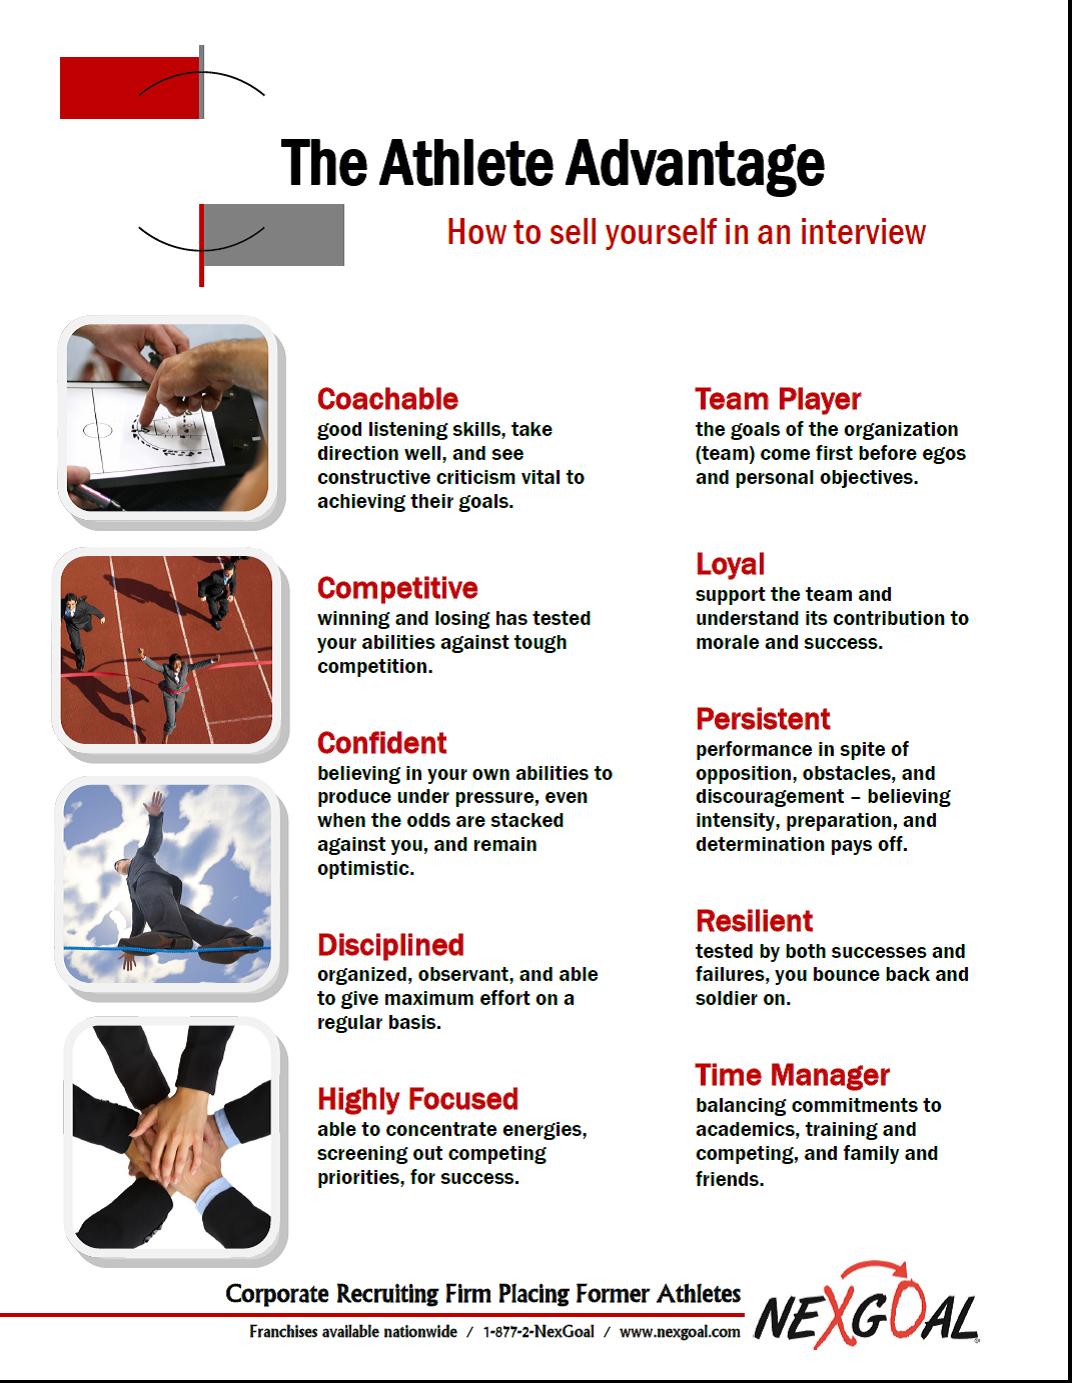 The Athlete Advantage